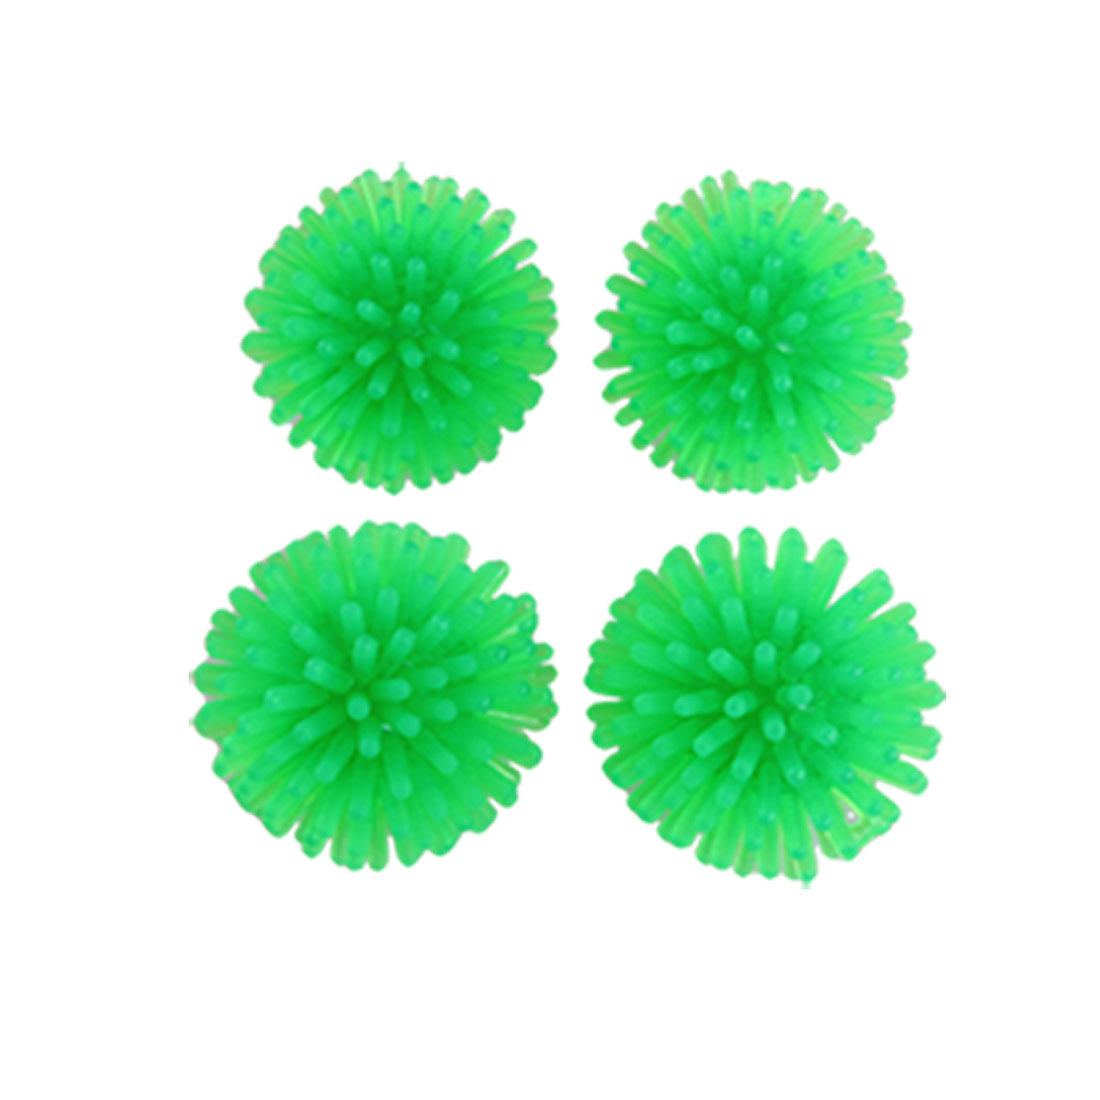 4 Pcs Mini Green Soft Plastic Fish Tank Echinus Decoration